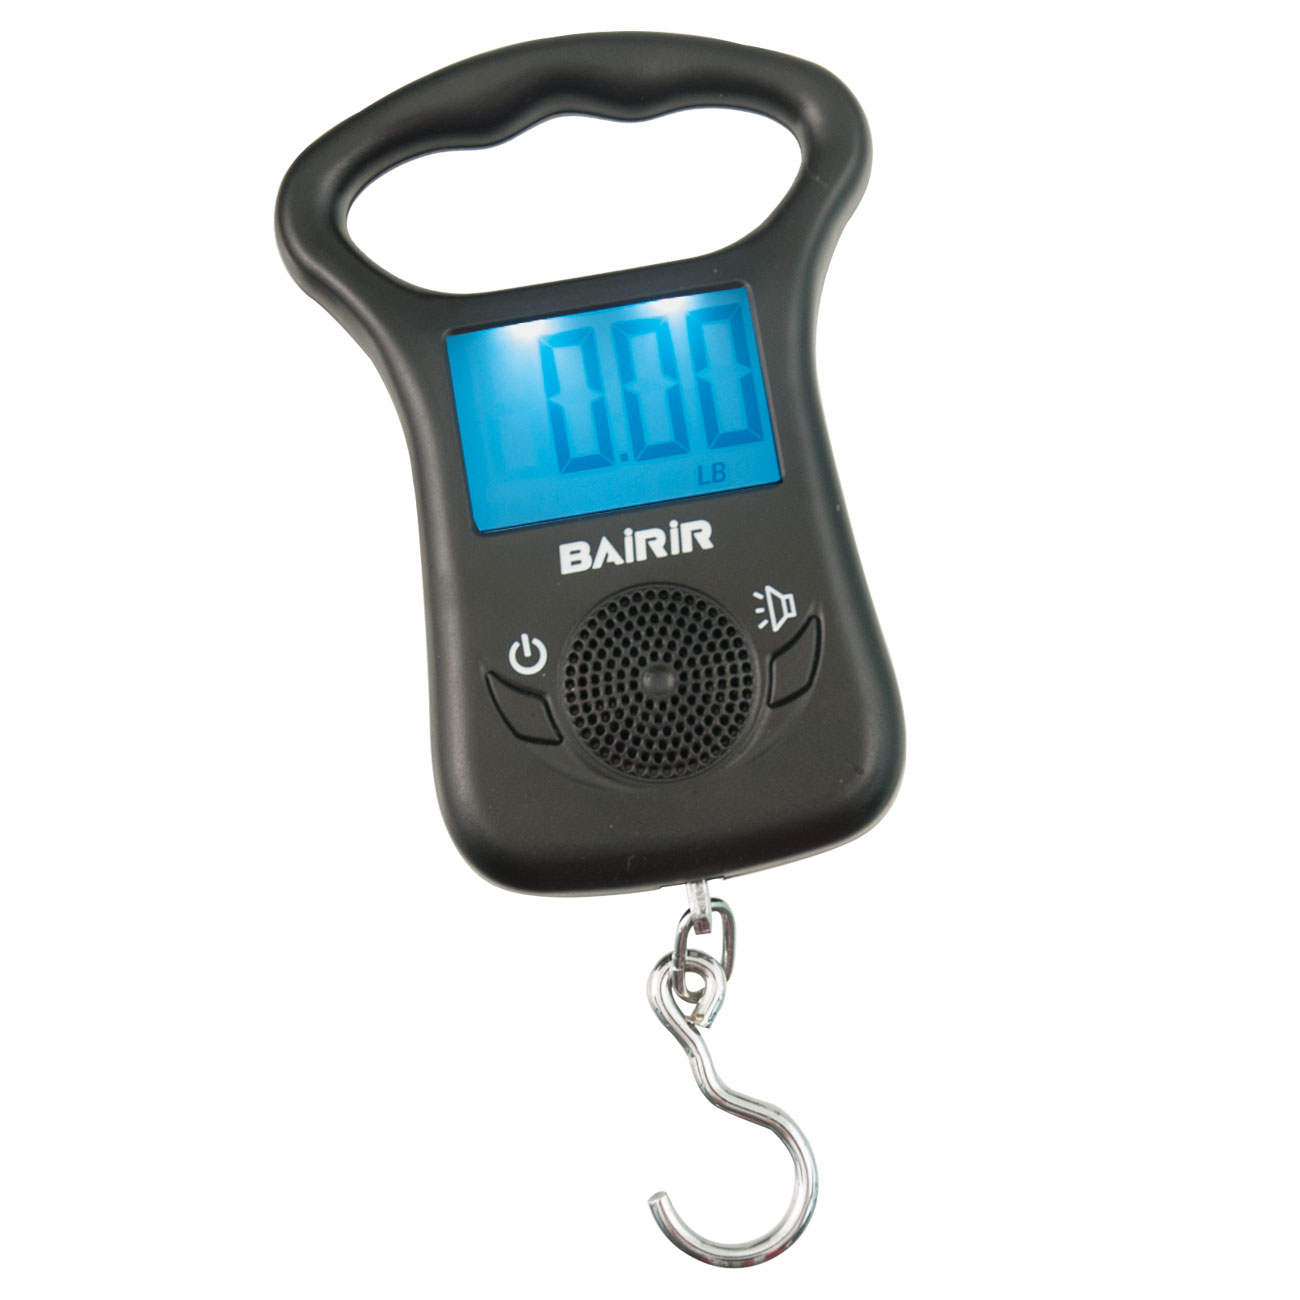 Digital Talking Portable Luggage Scale